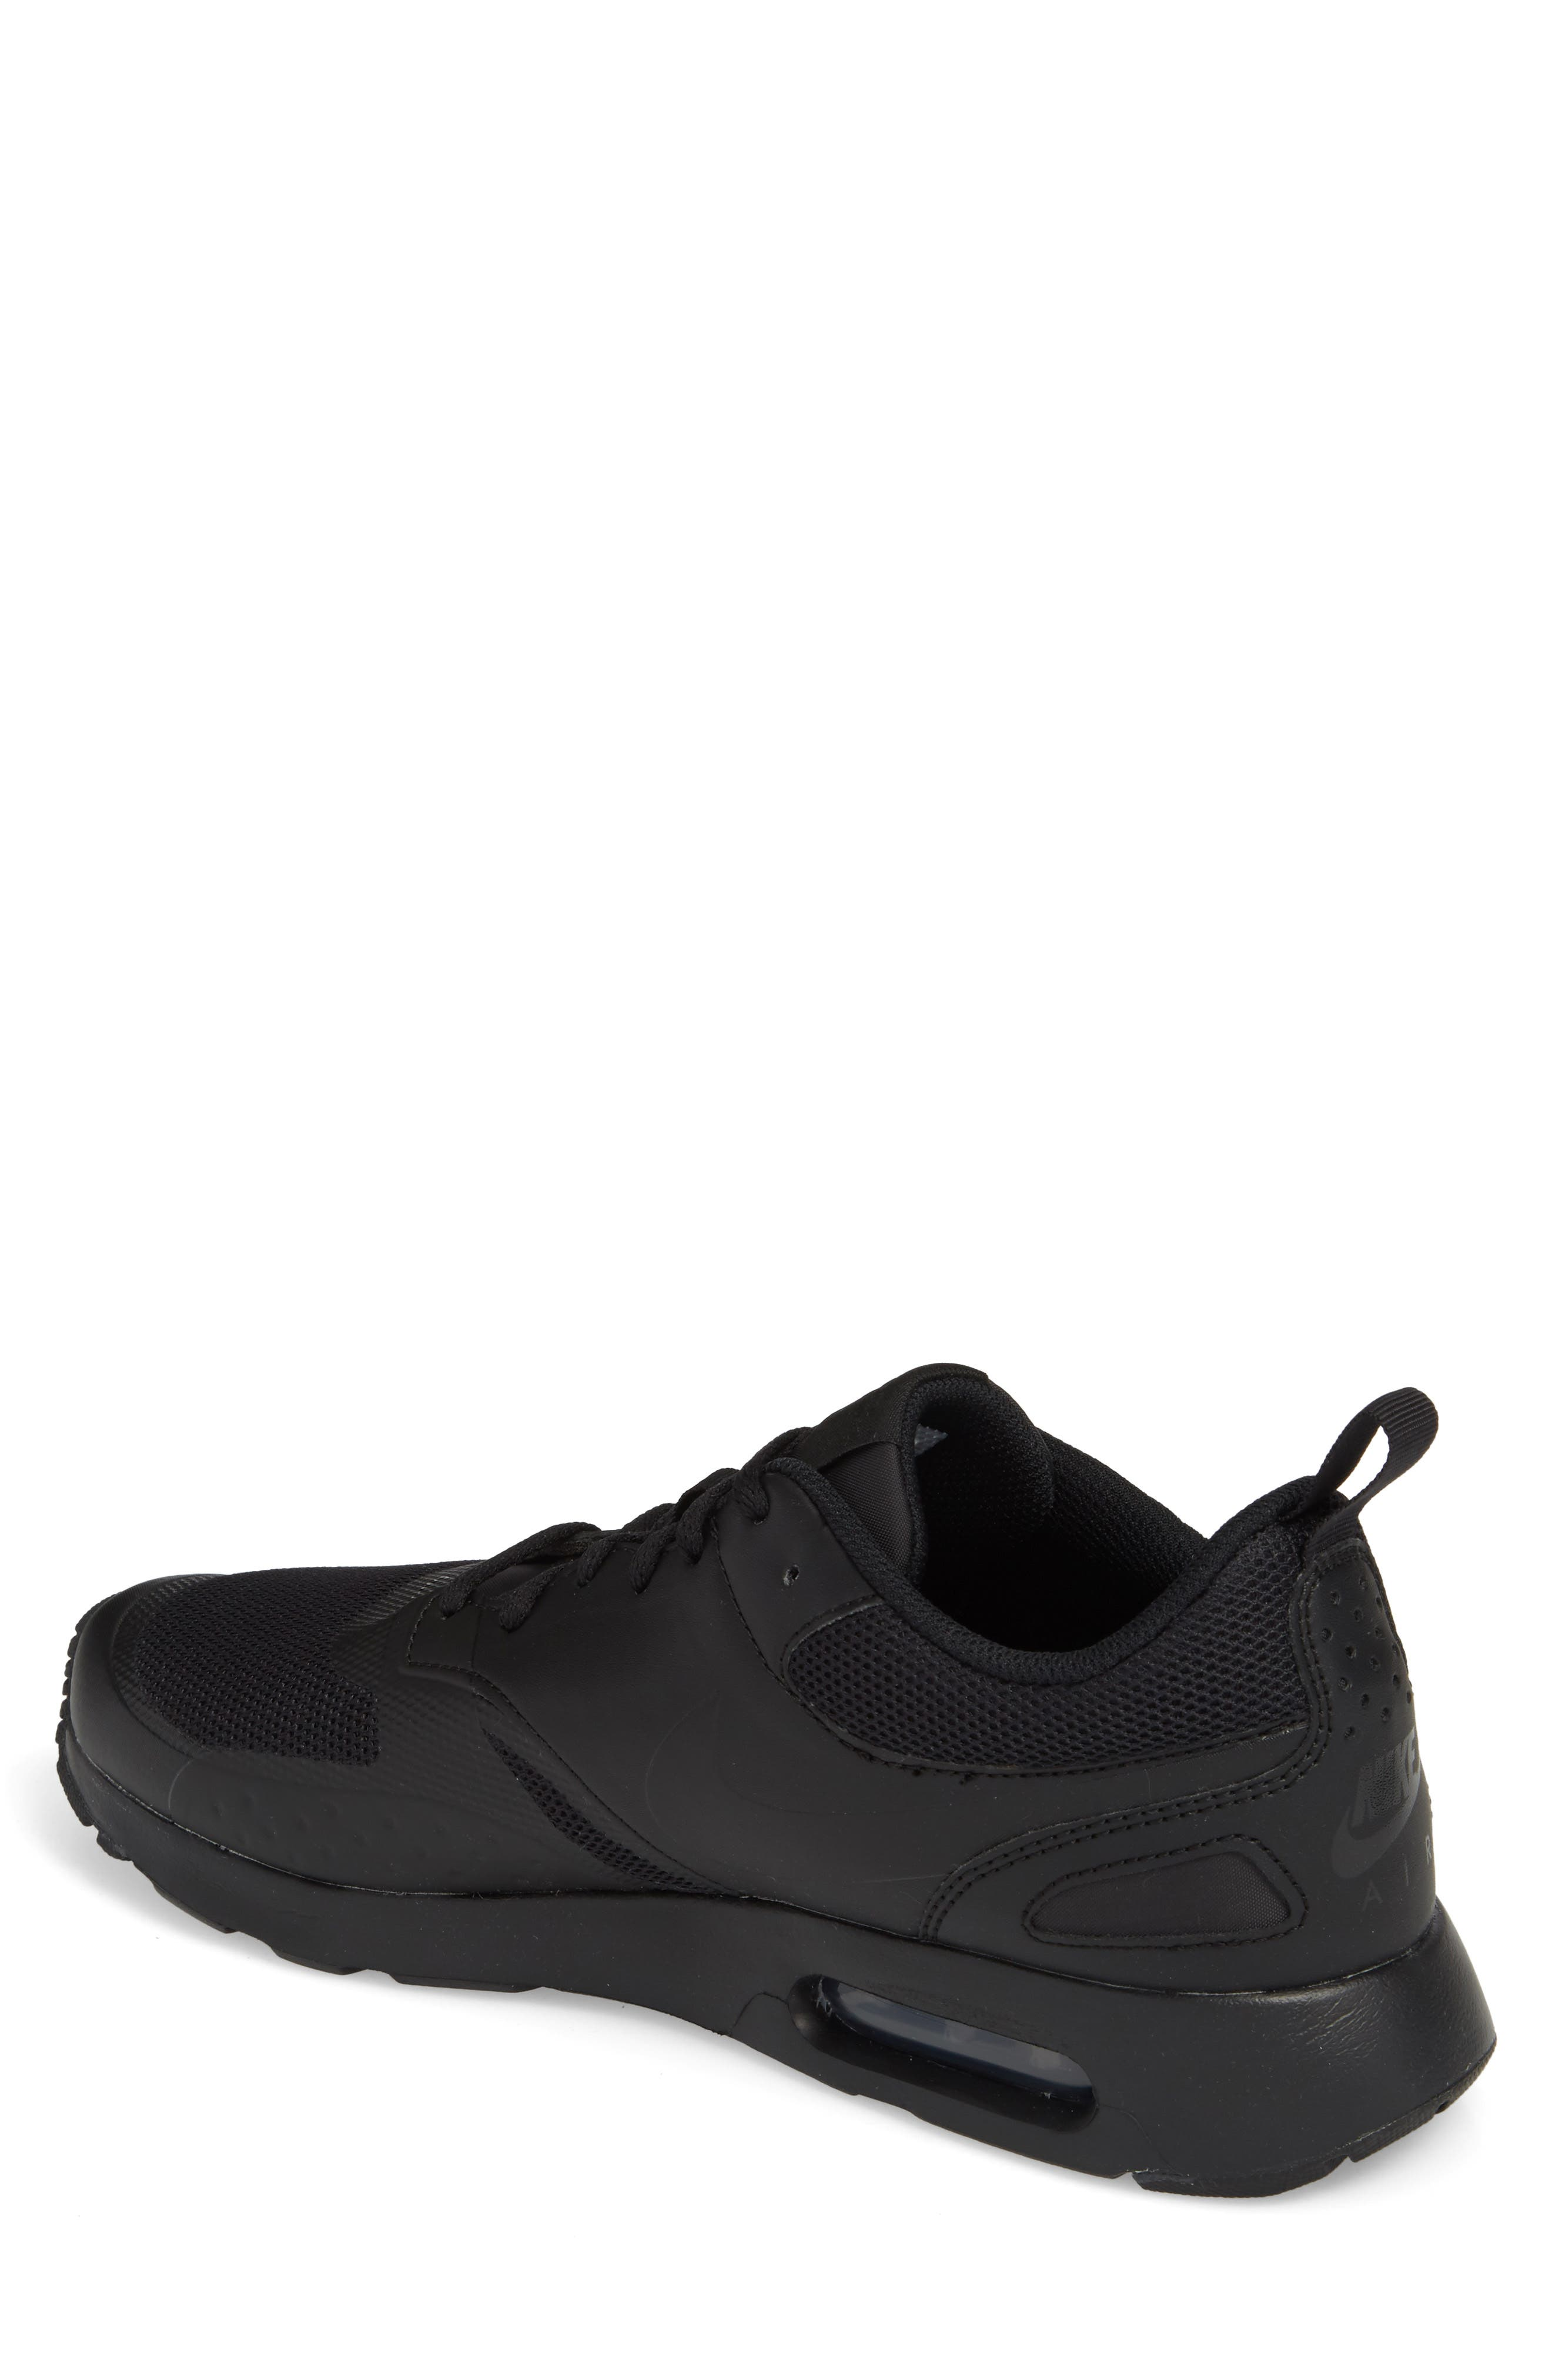 Air Max Vision Sneaker,                             Alternate thumbnail 2, color,                             BLACK/ BLACK